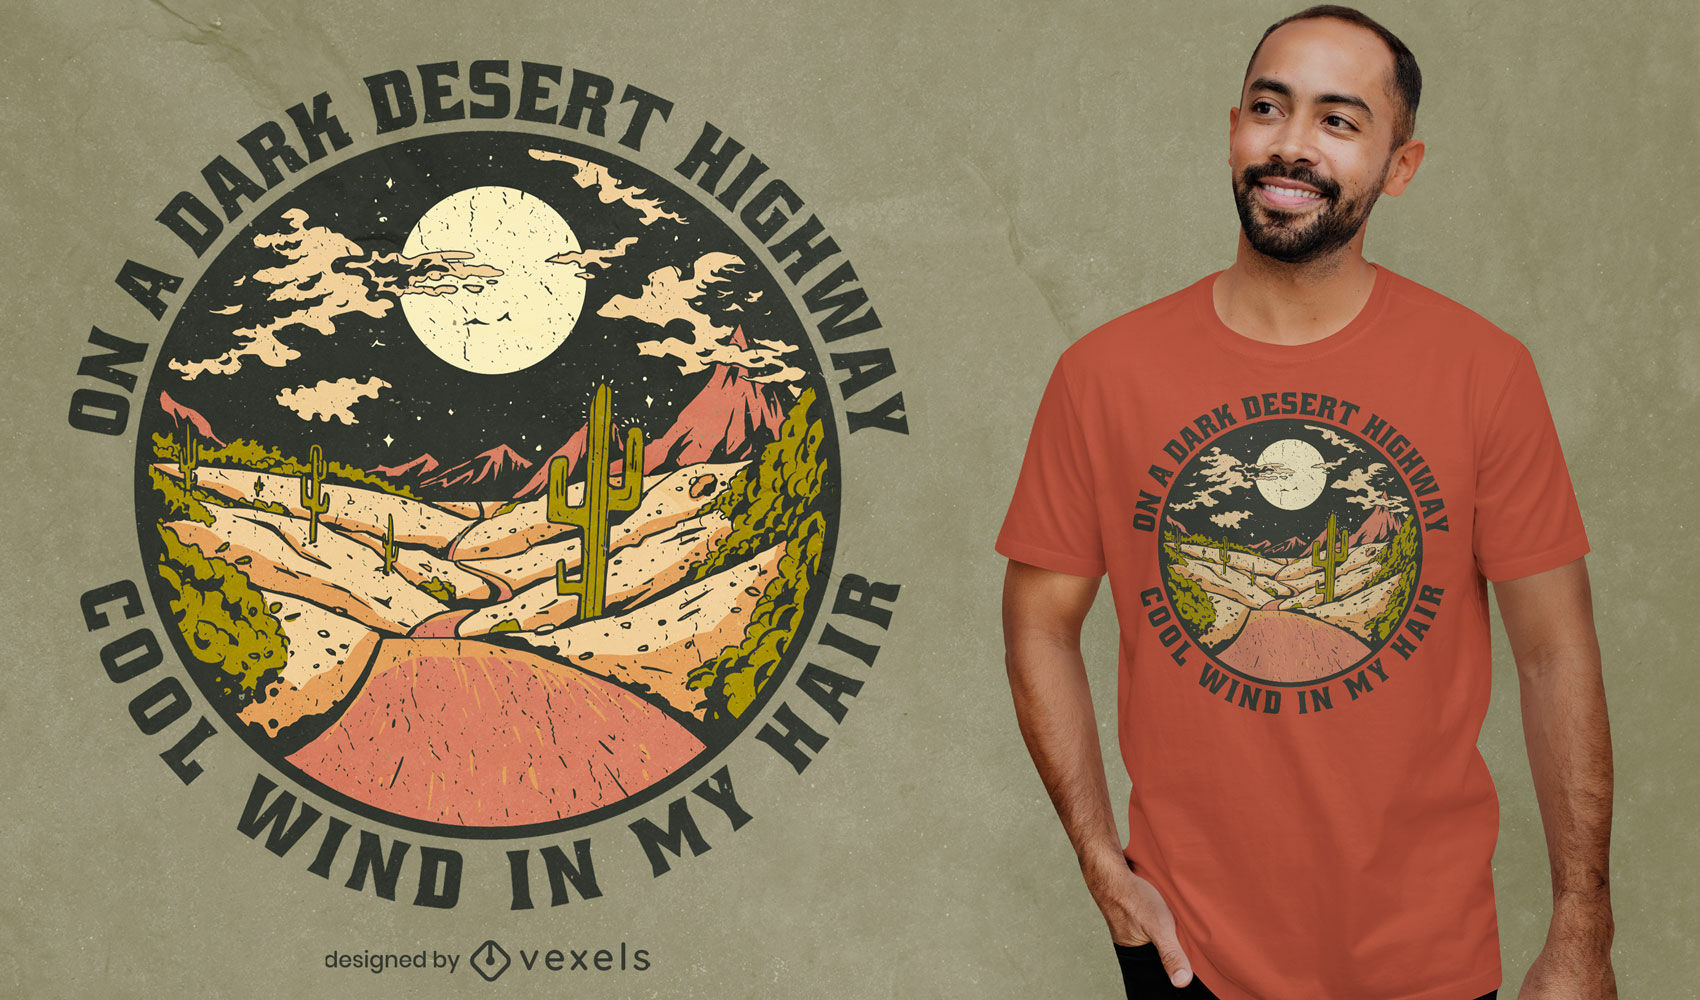 Desert highway quote t-shirt design